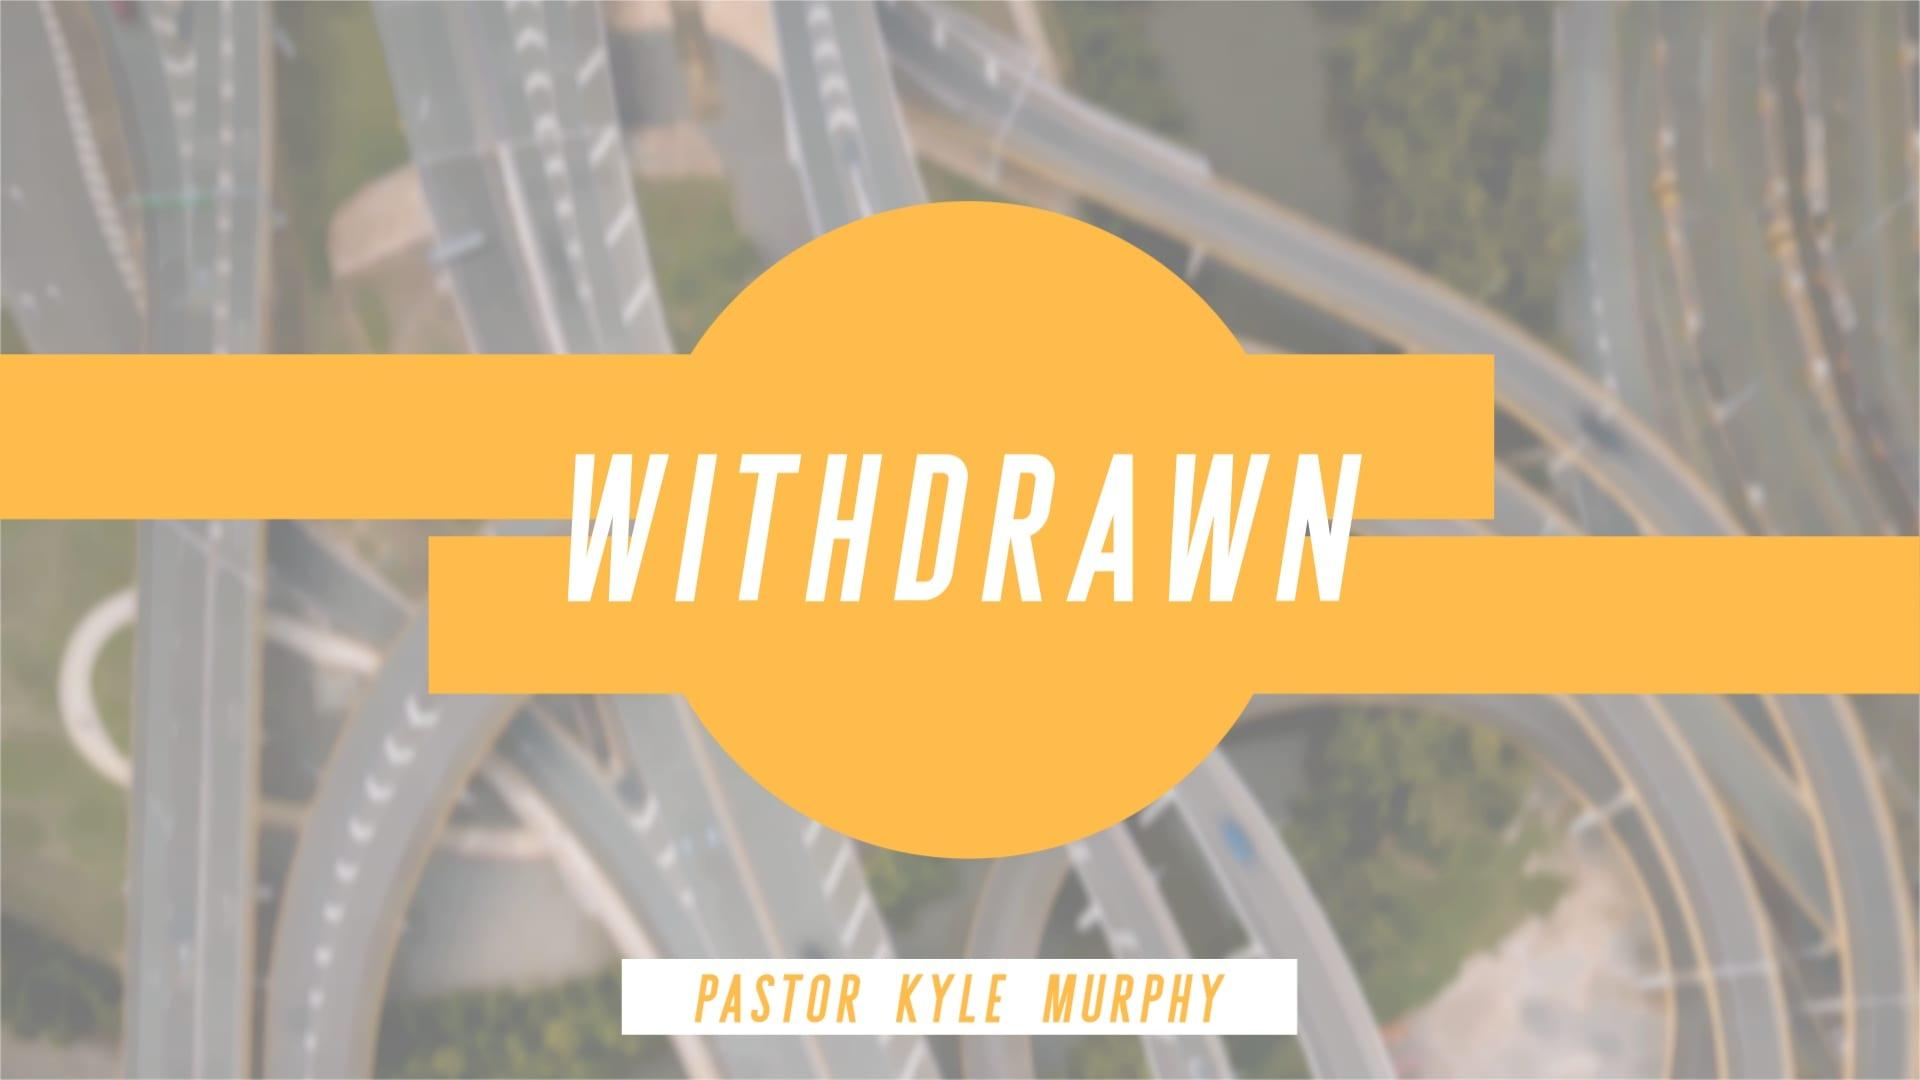 Withdrawn – 8th Street